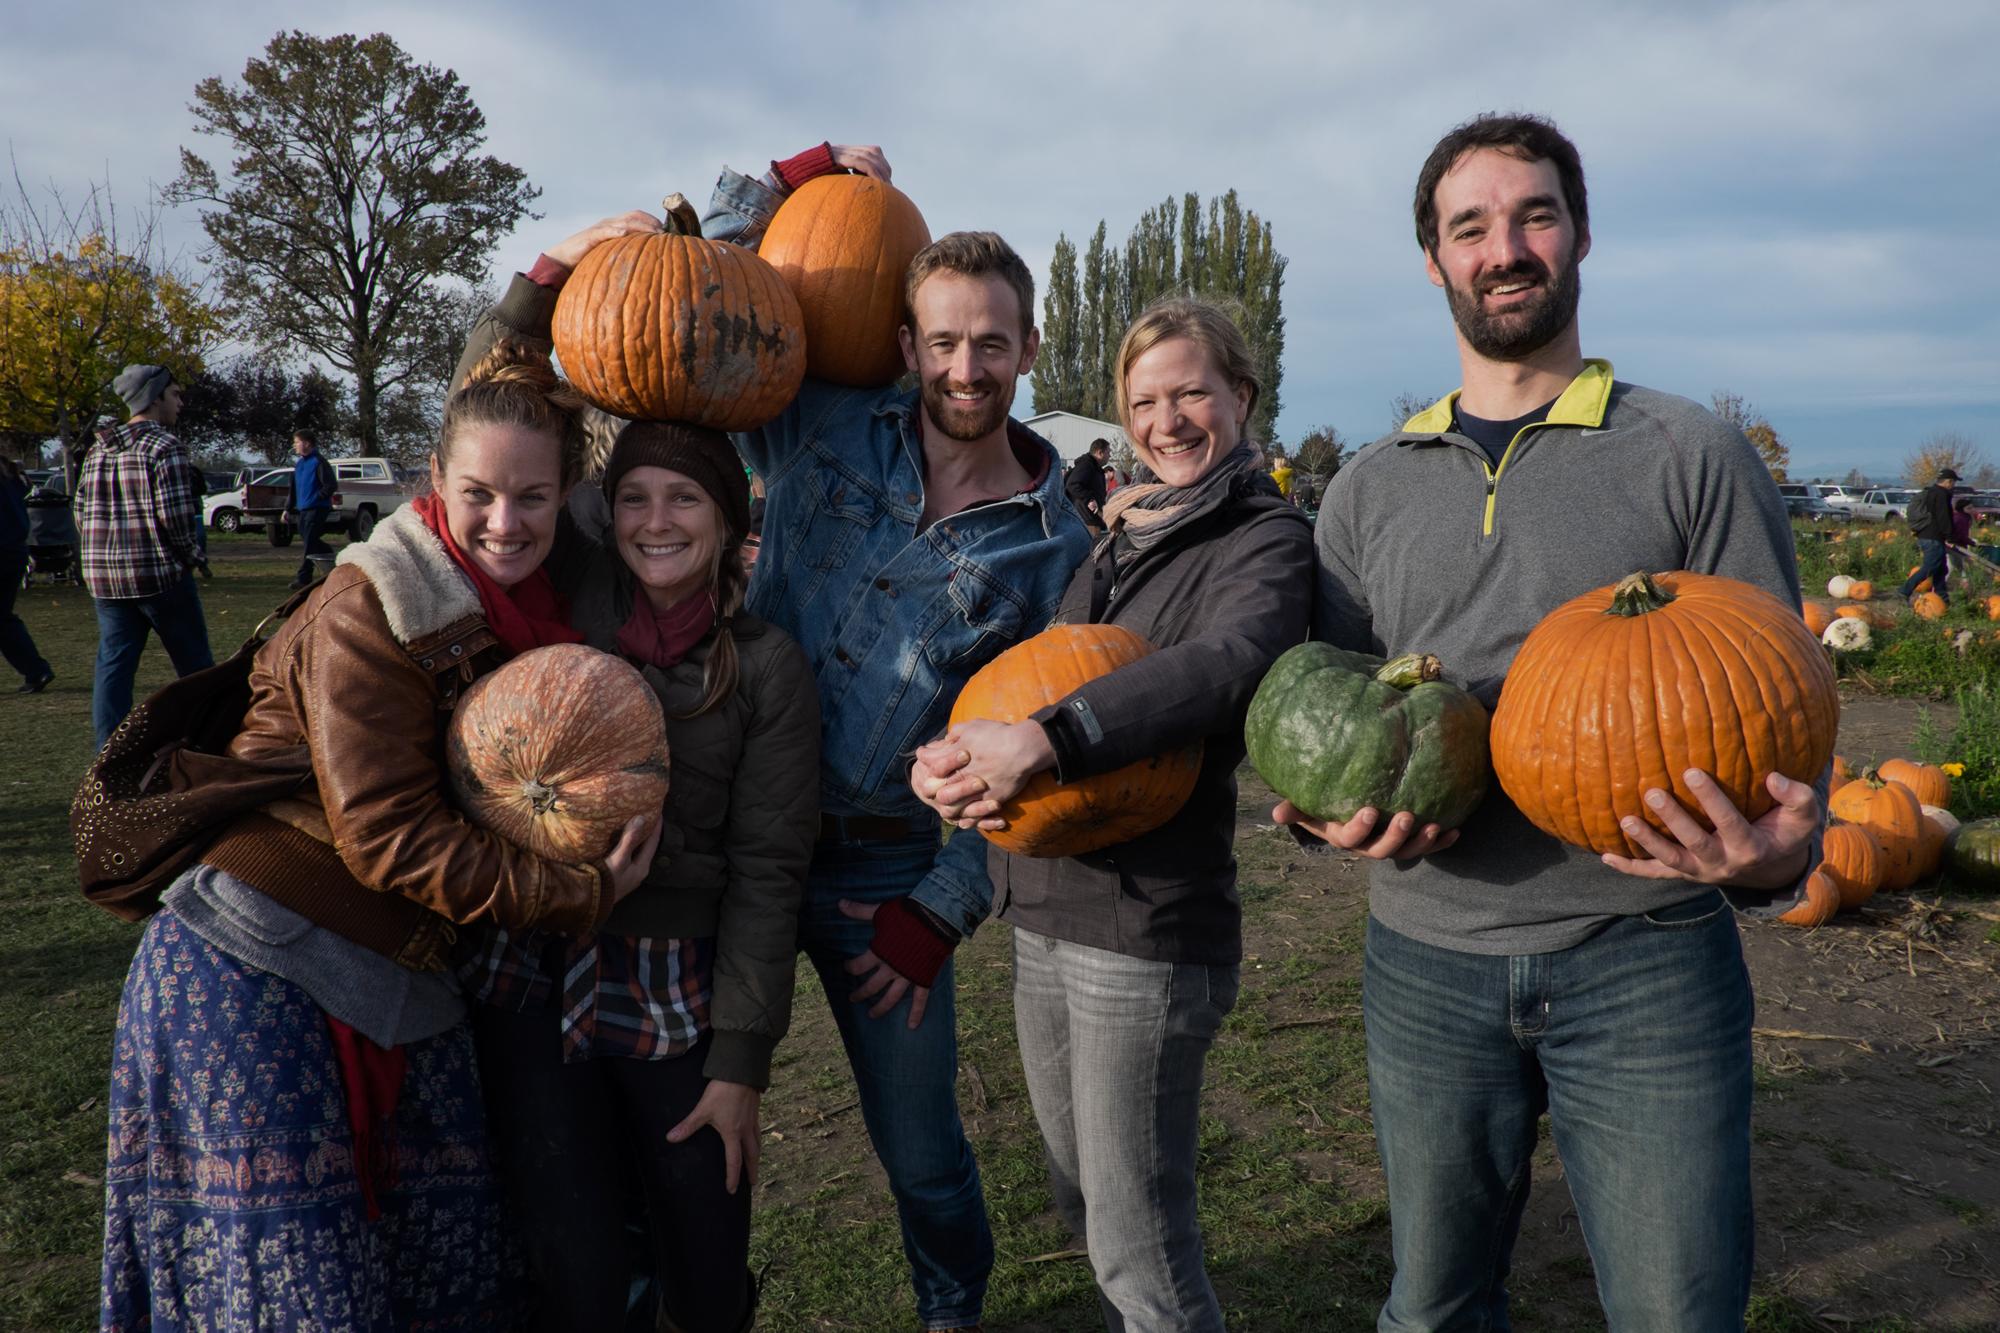 Rachel Tefft, Emily Naftalin, David, Laurie Webb, and Sean Mesford  at Craven Farm, Snohomish, Washington